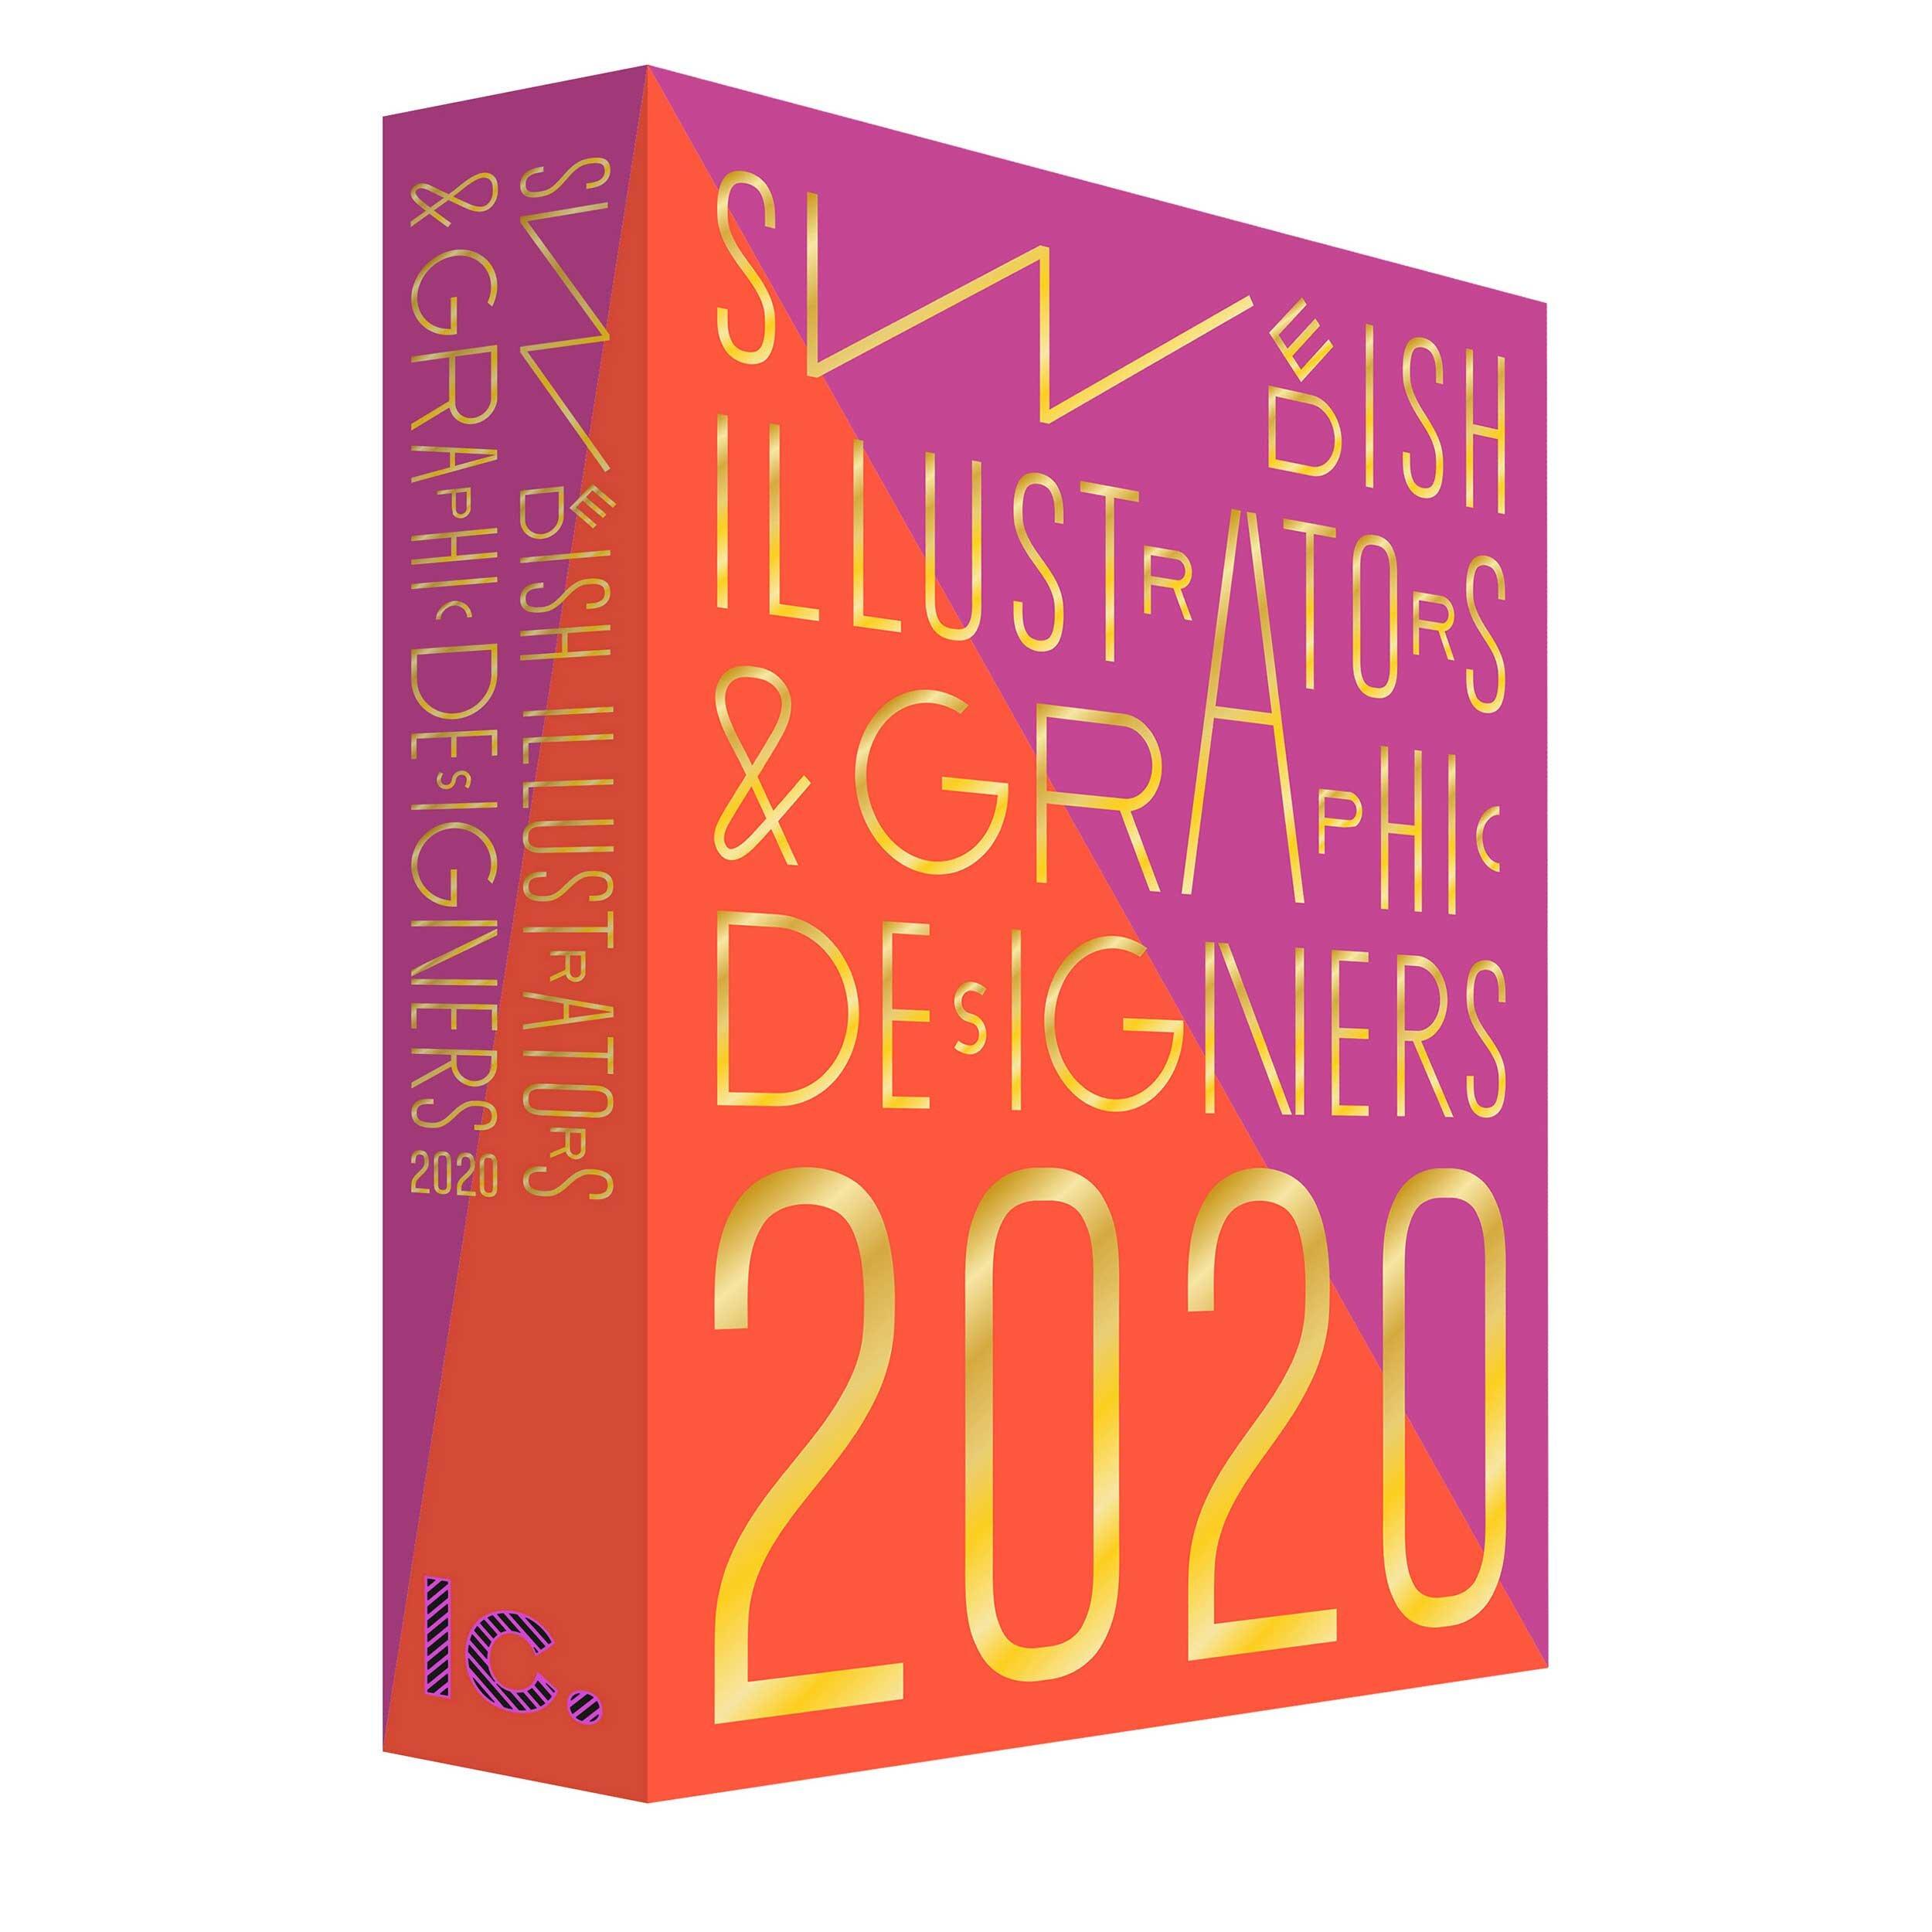 Swedish Illustrators & Graphic Designers 2020